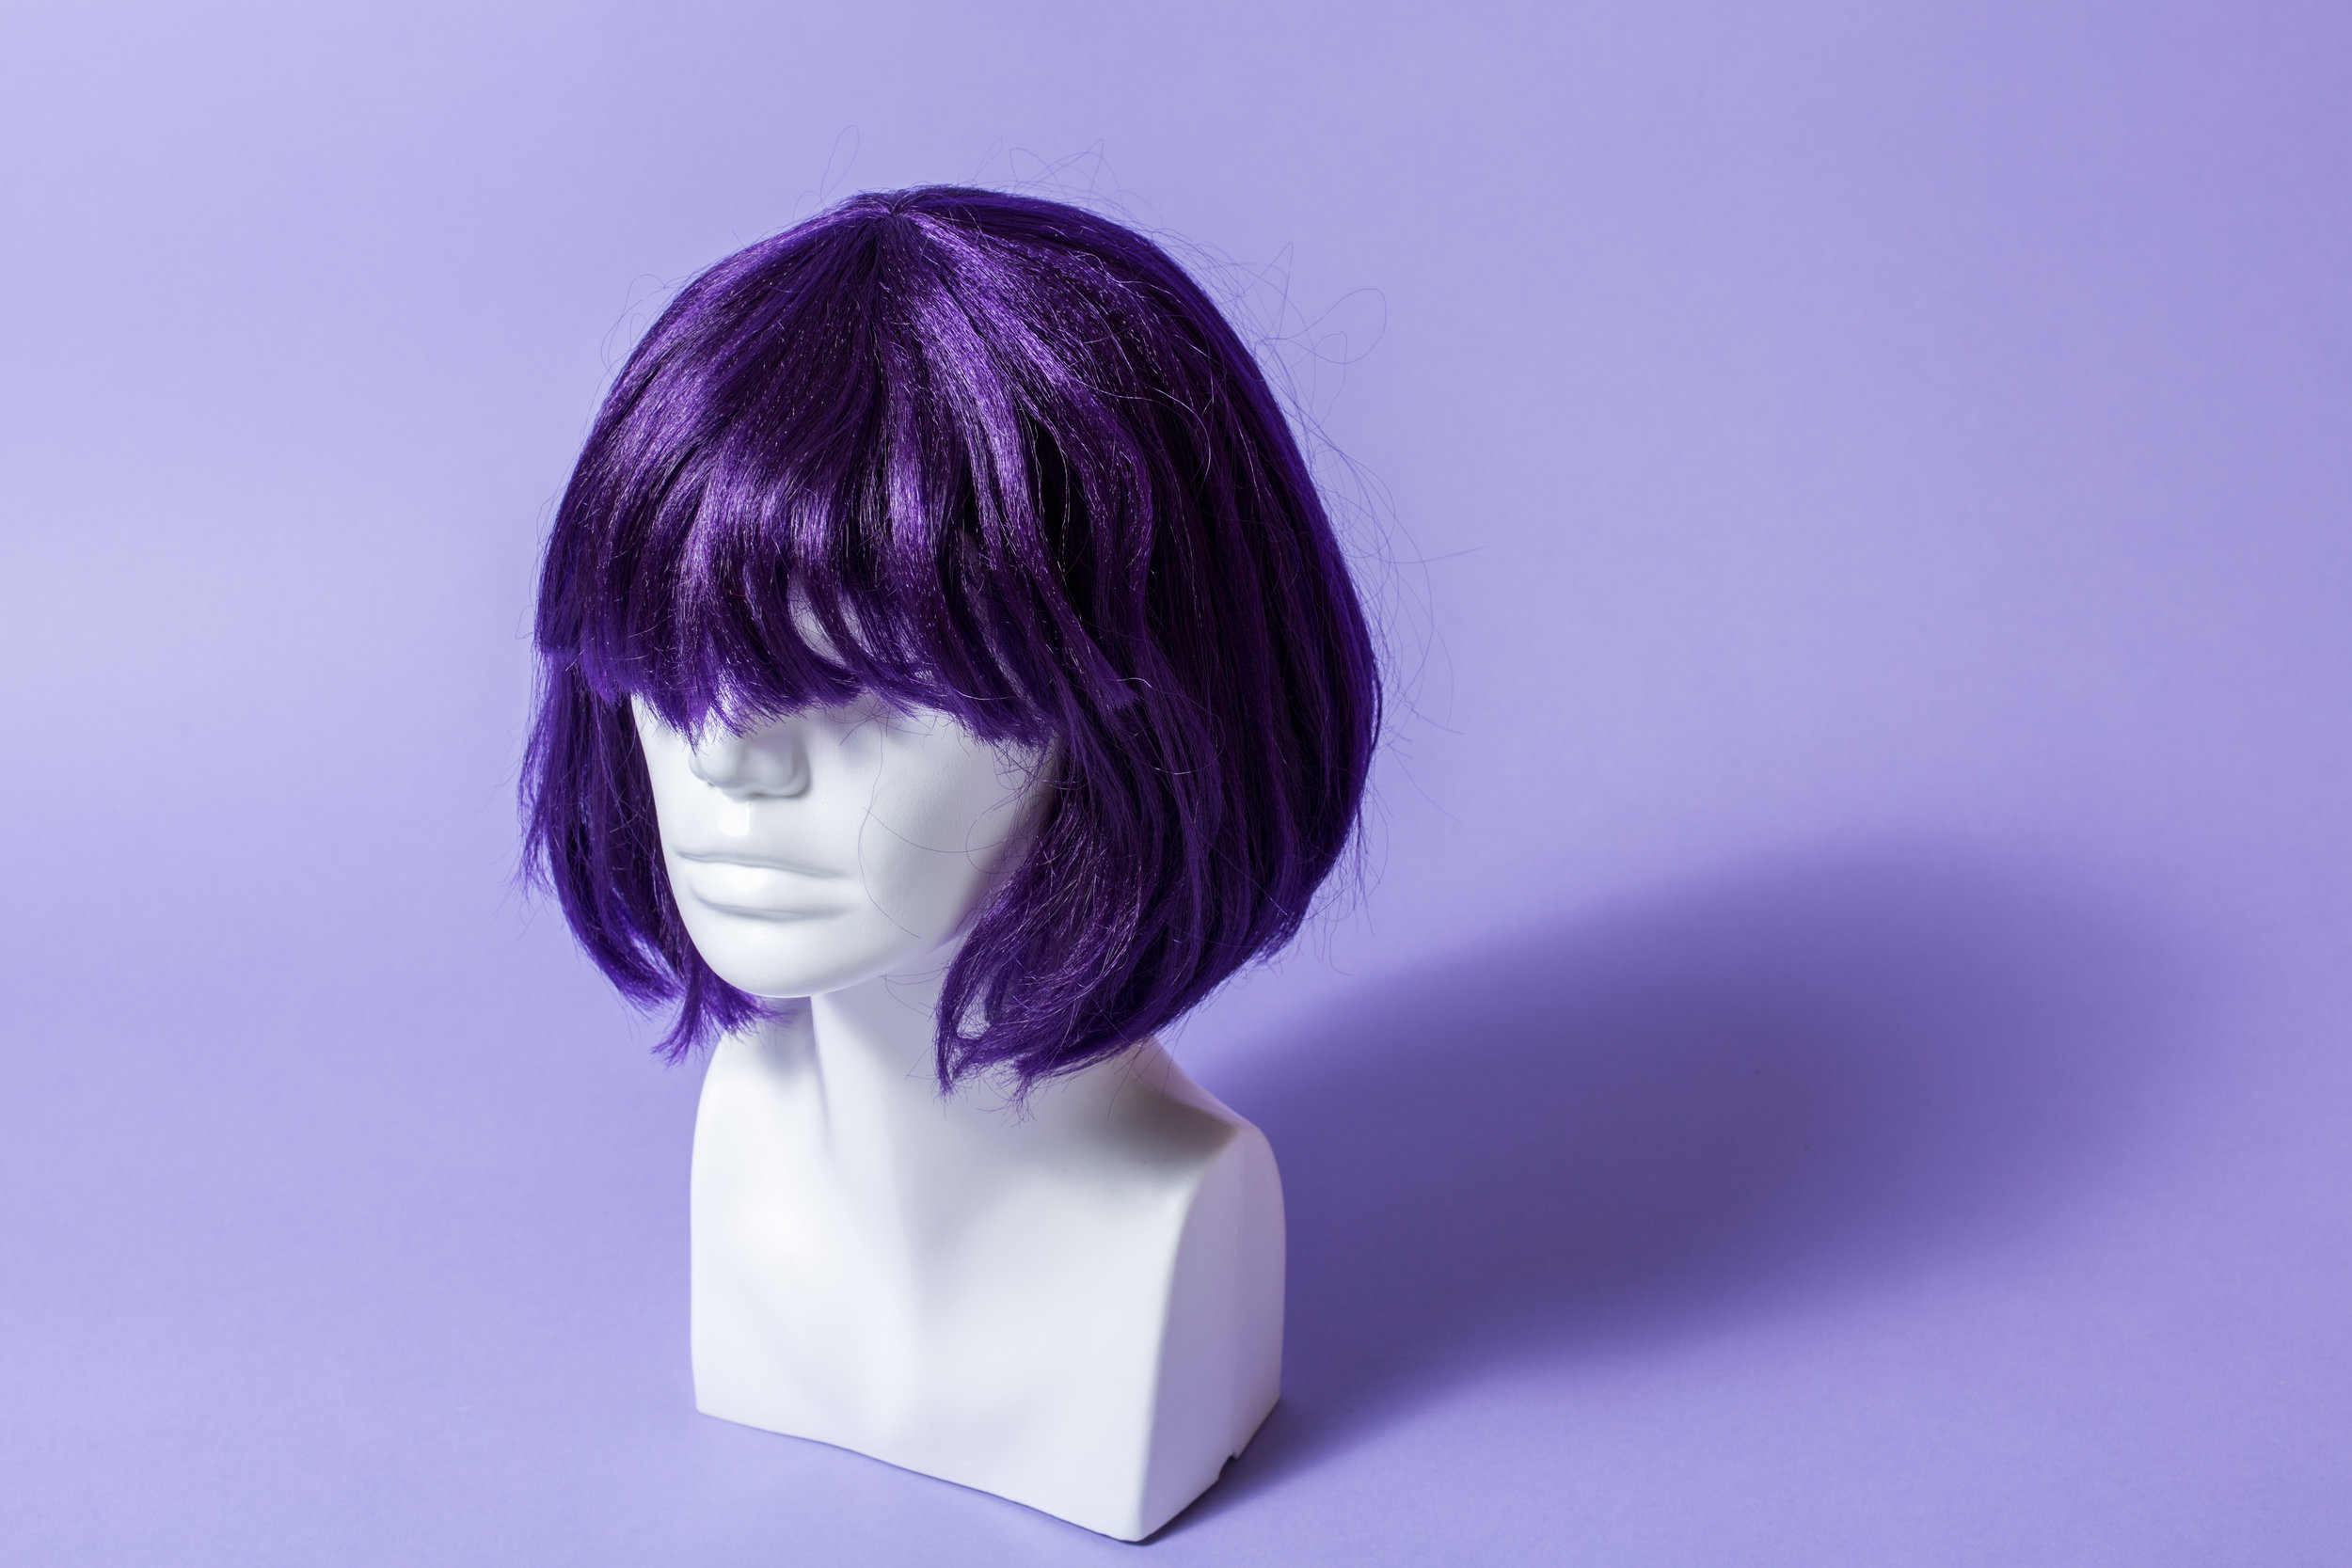 Monochrome Violet No. 1